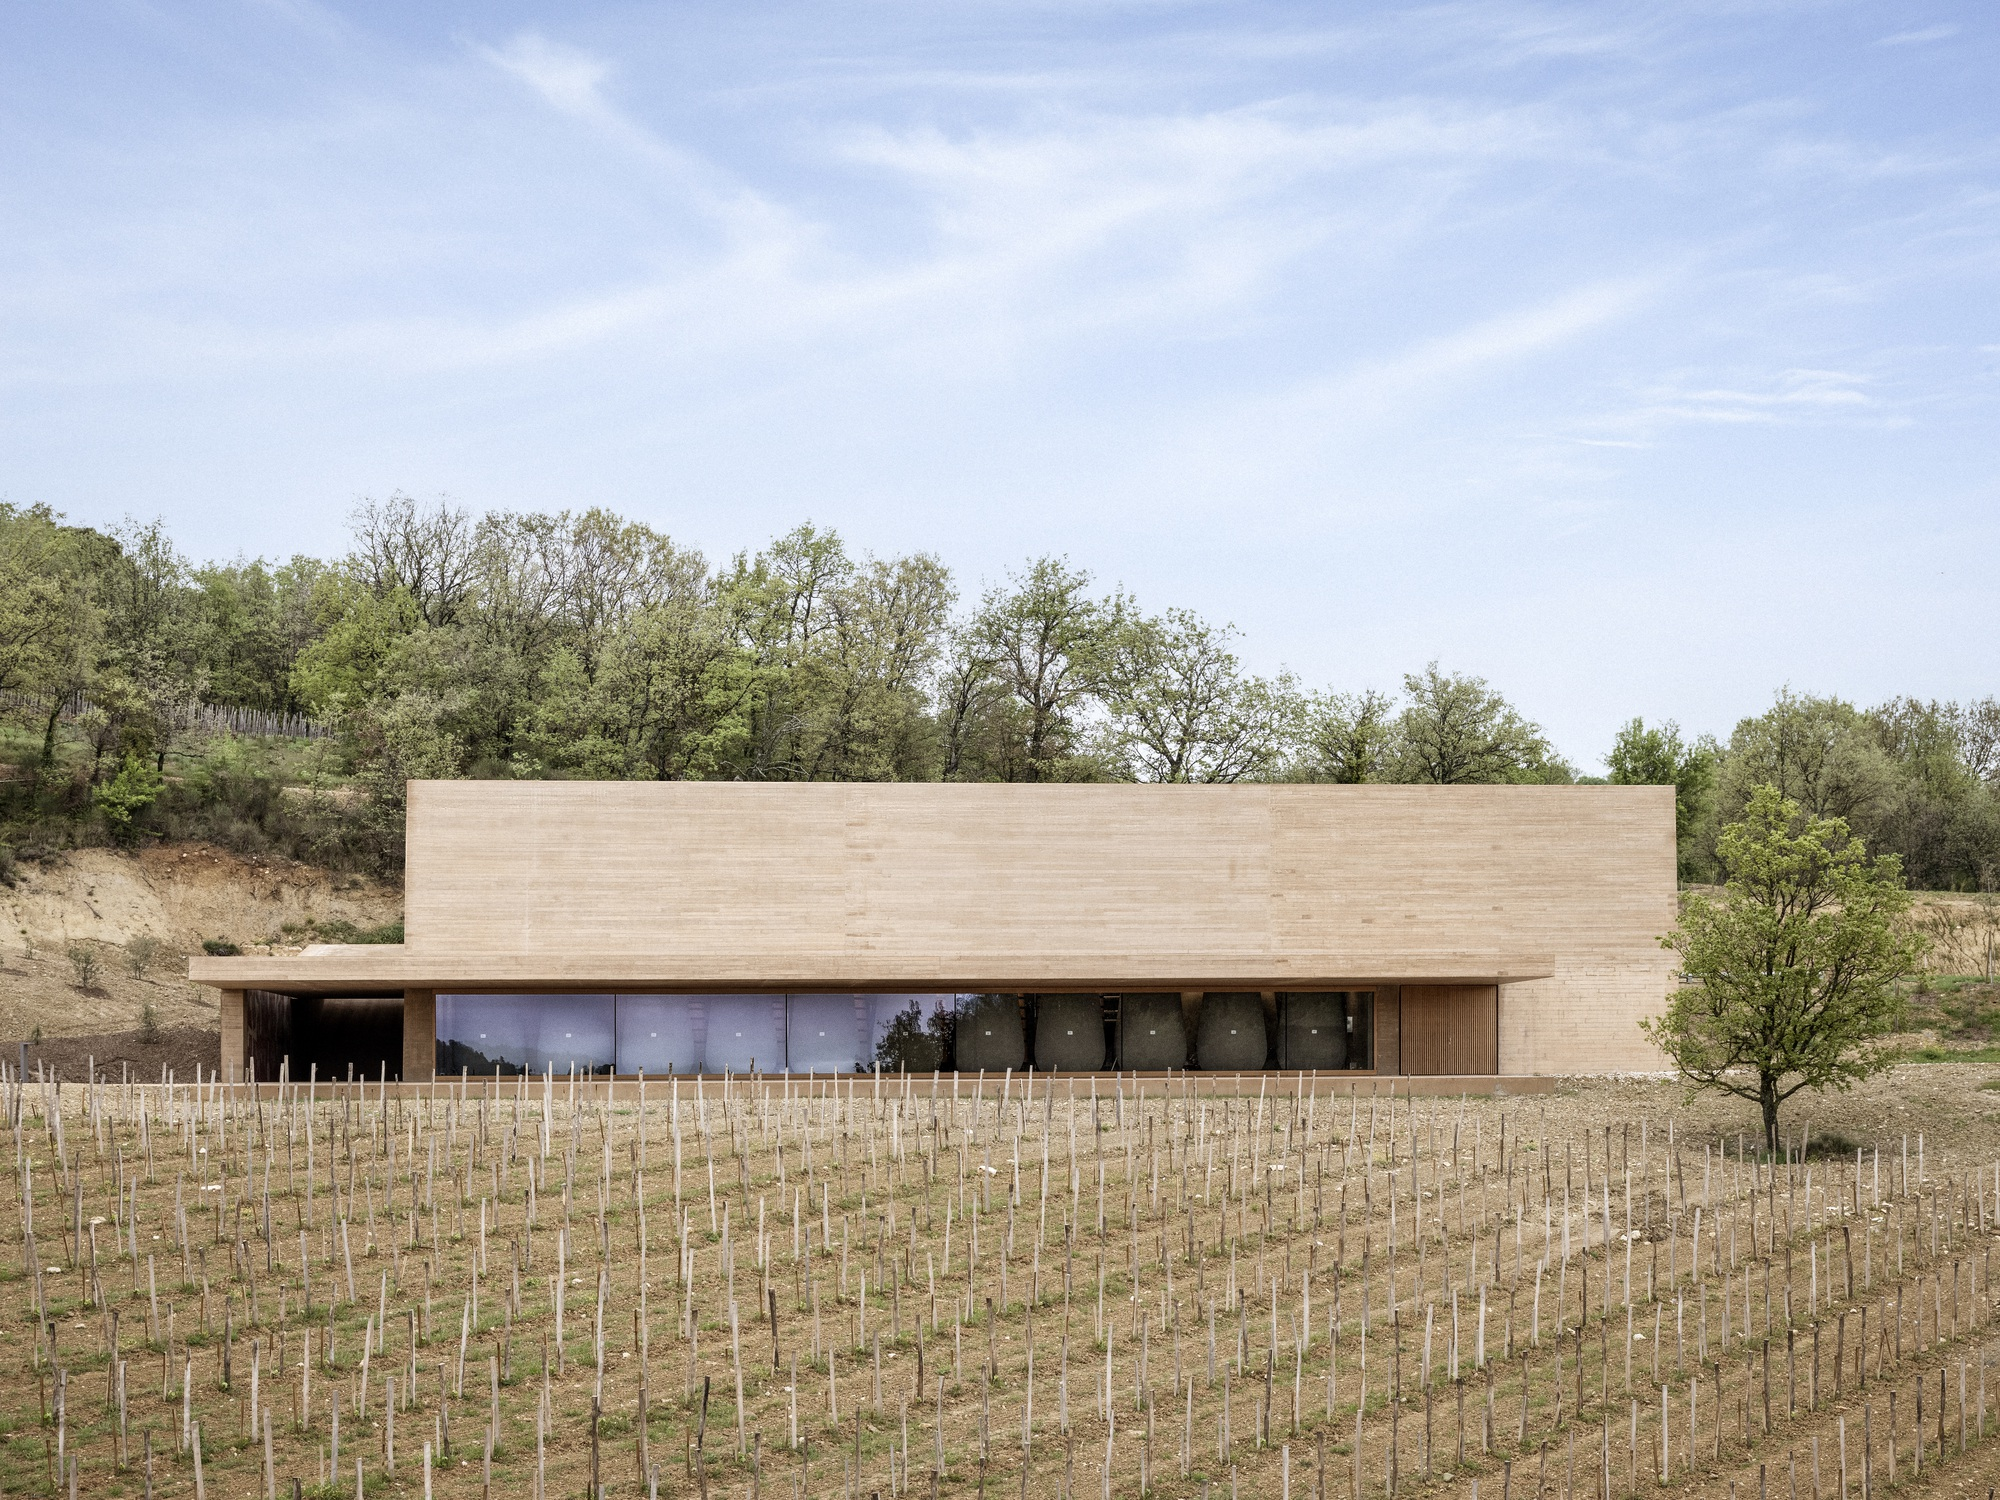 Les Davids Winery / Atelier Marc Barani